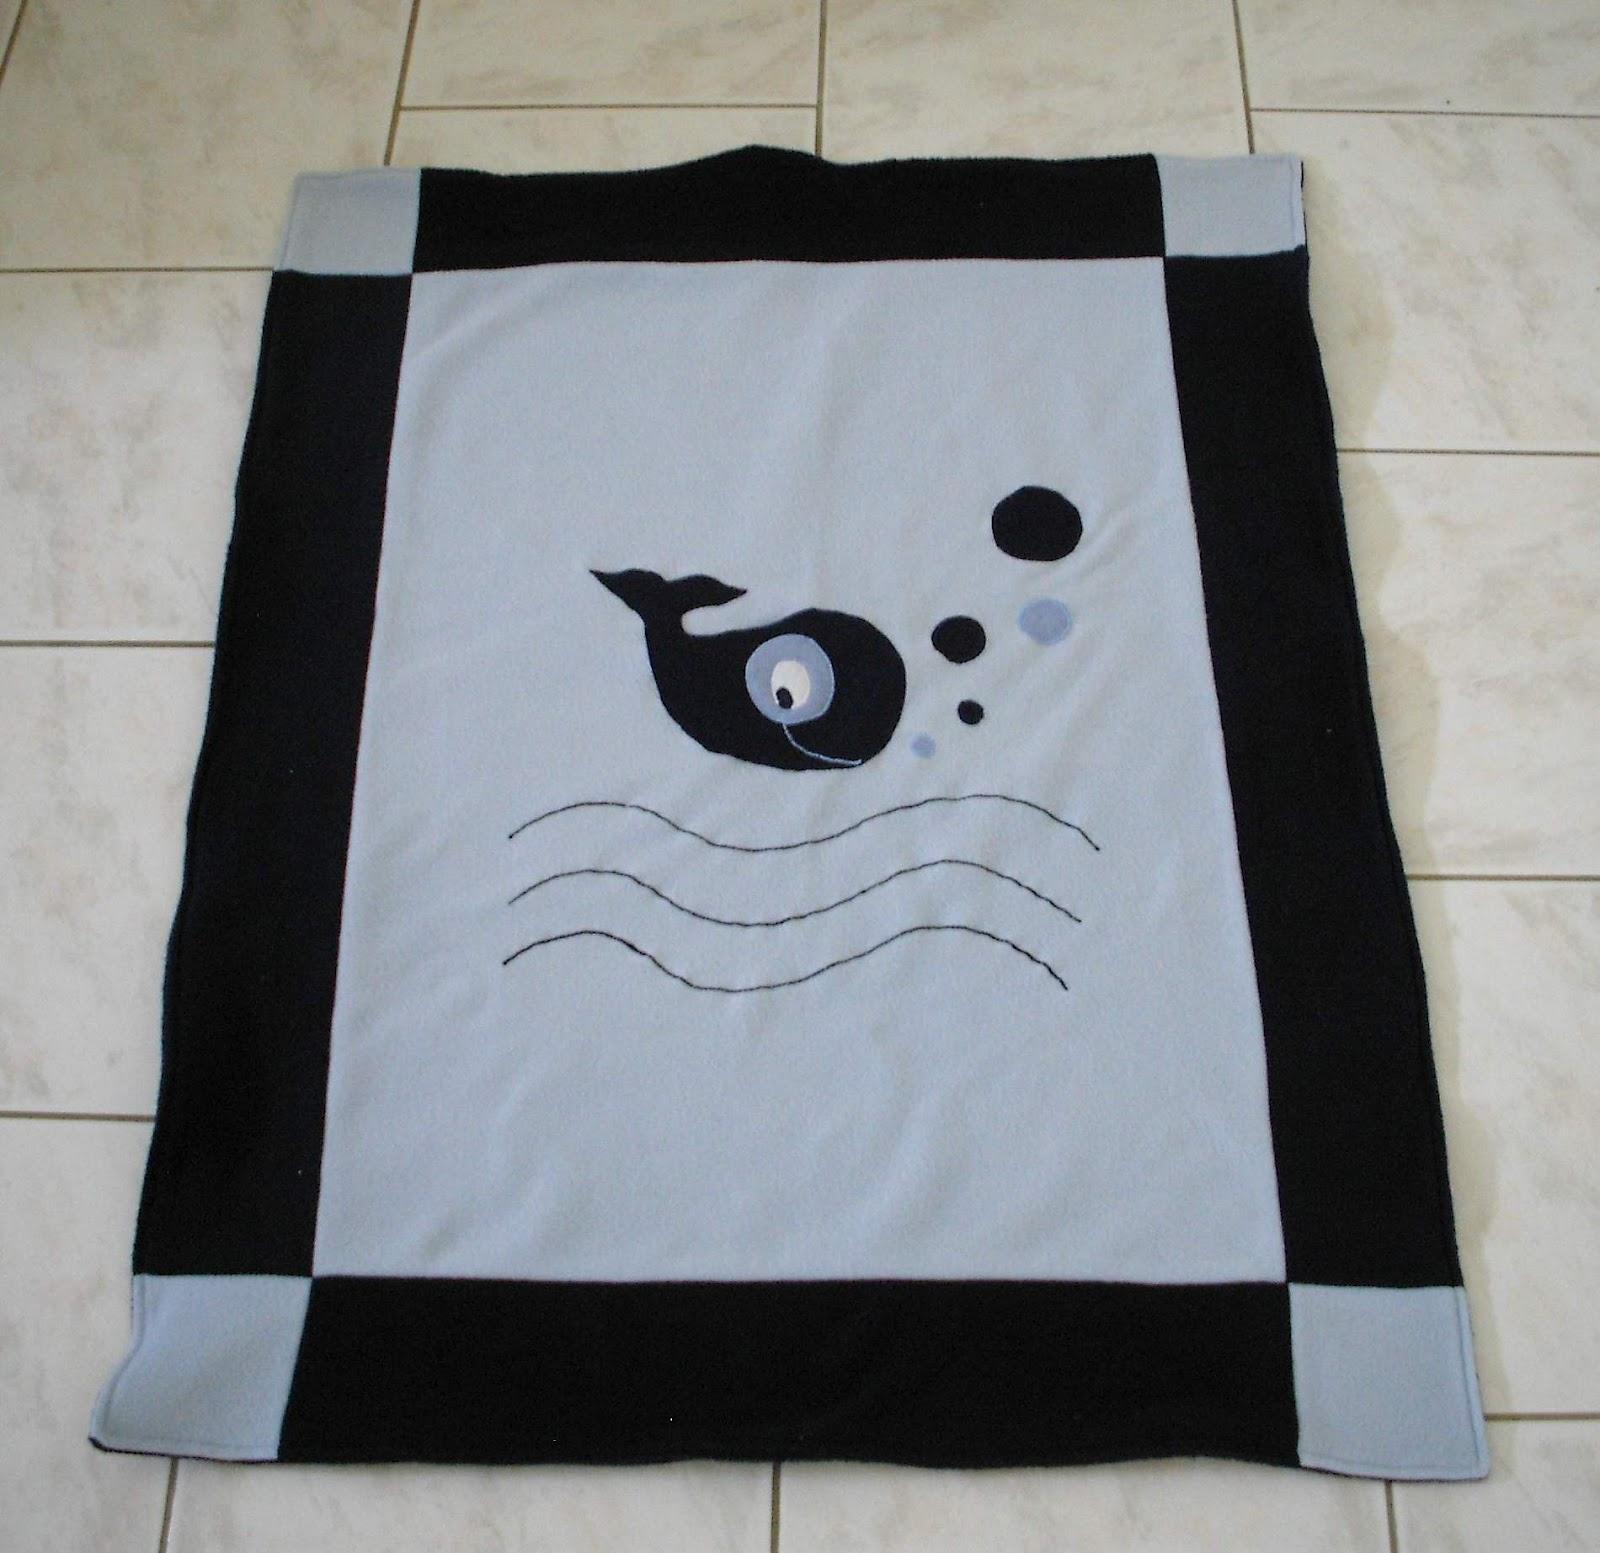 ma tambouille cr ative couverture baleine pour lit b b. Black Bedroom Furniture Sets. Home Design Ideas